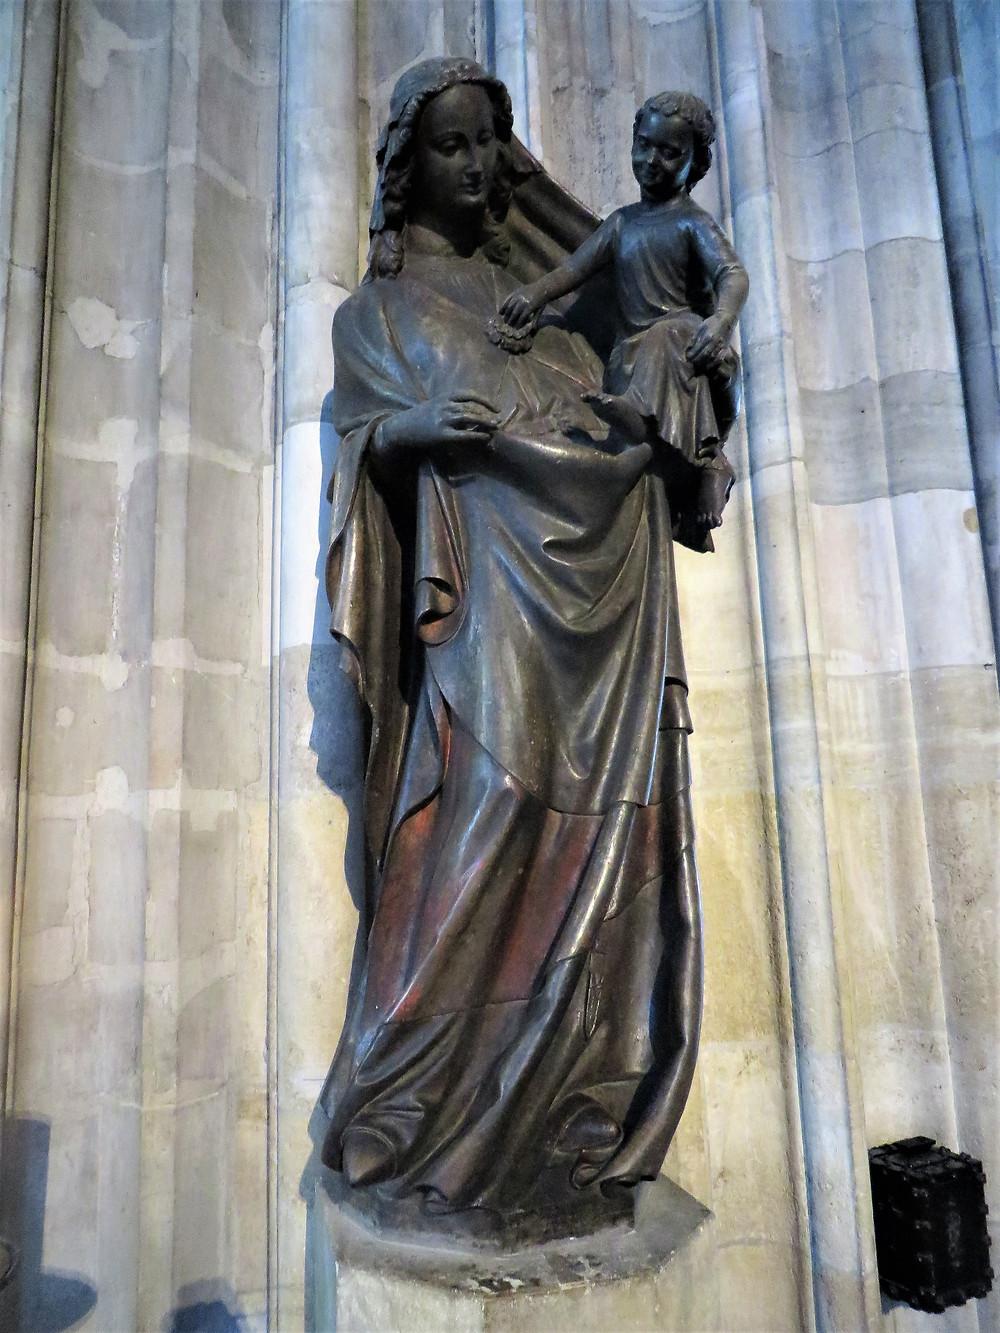 Madonna statue in St Stephen's Cathedral in Vienna